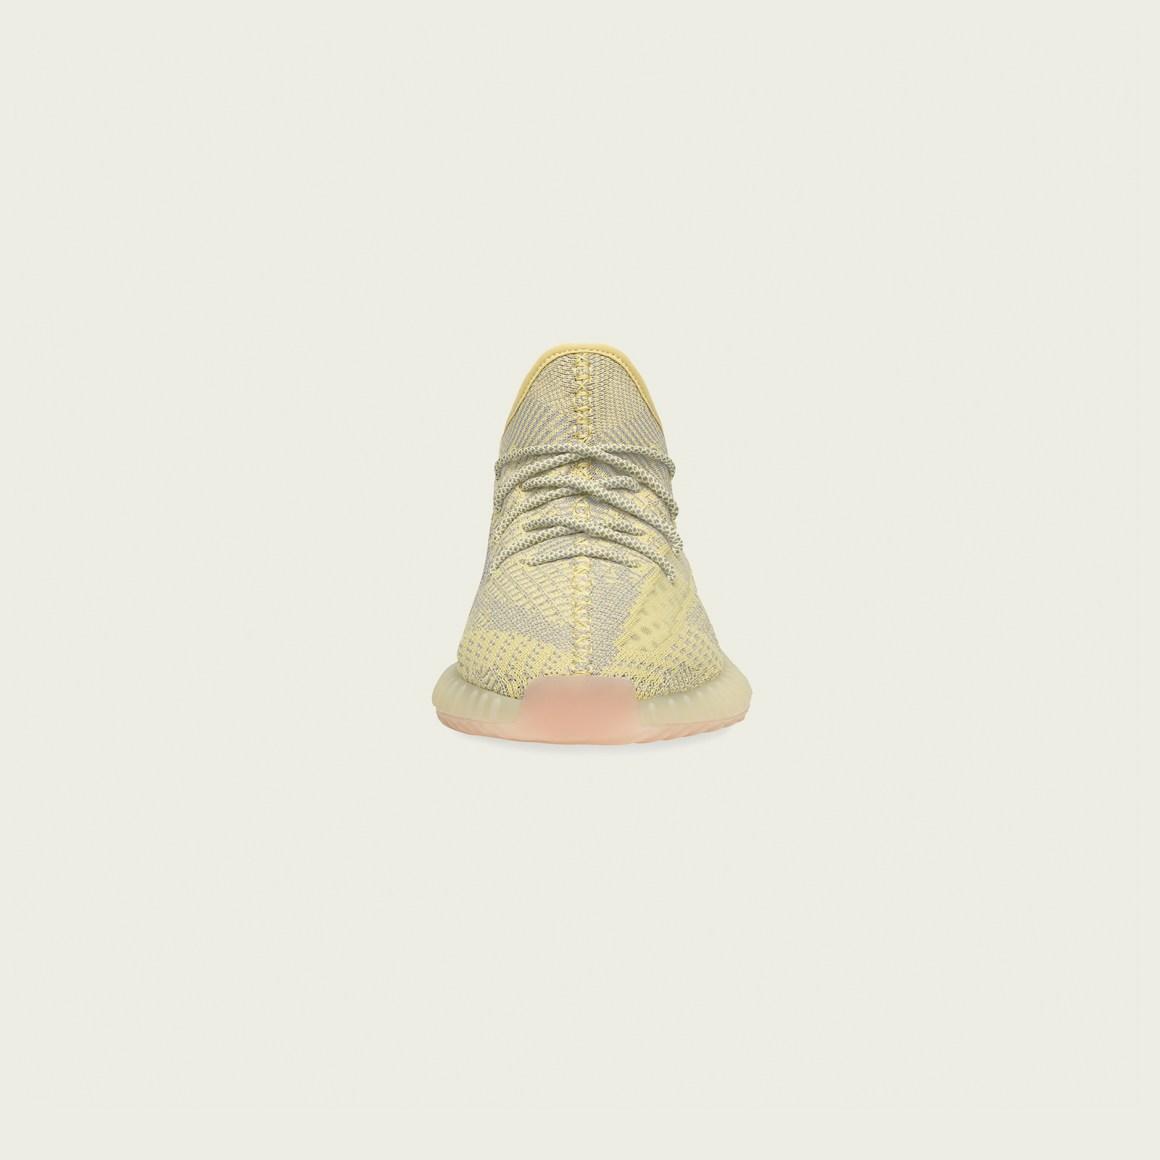 adidas Yeezy Boost 350 v2 ''Antlia''